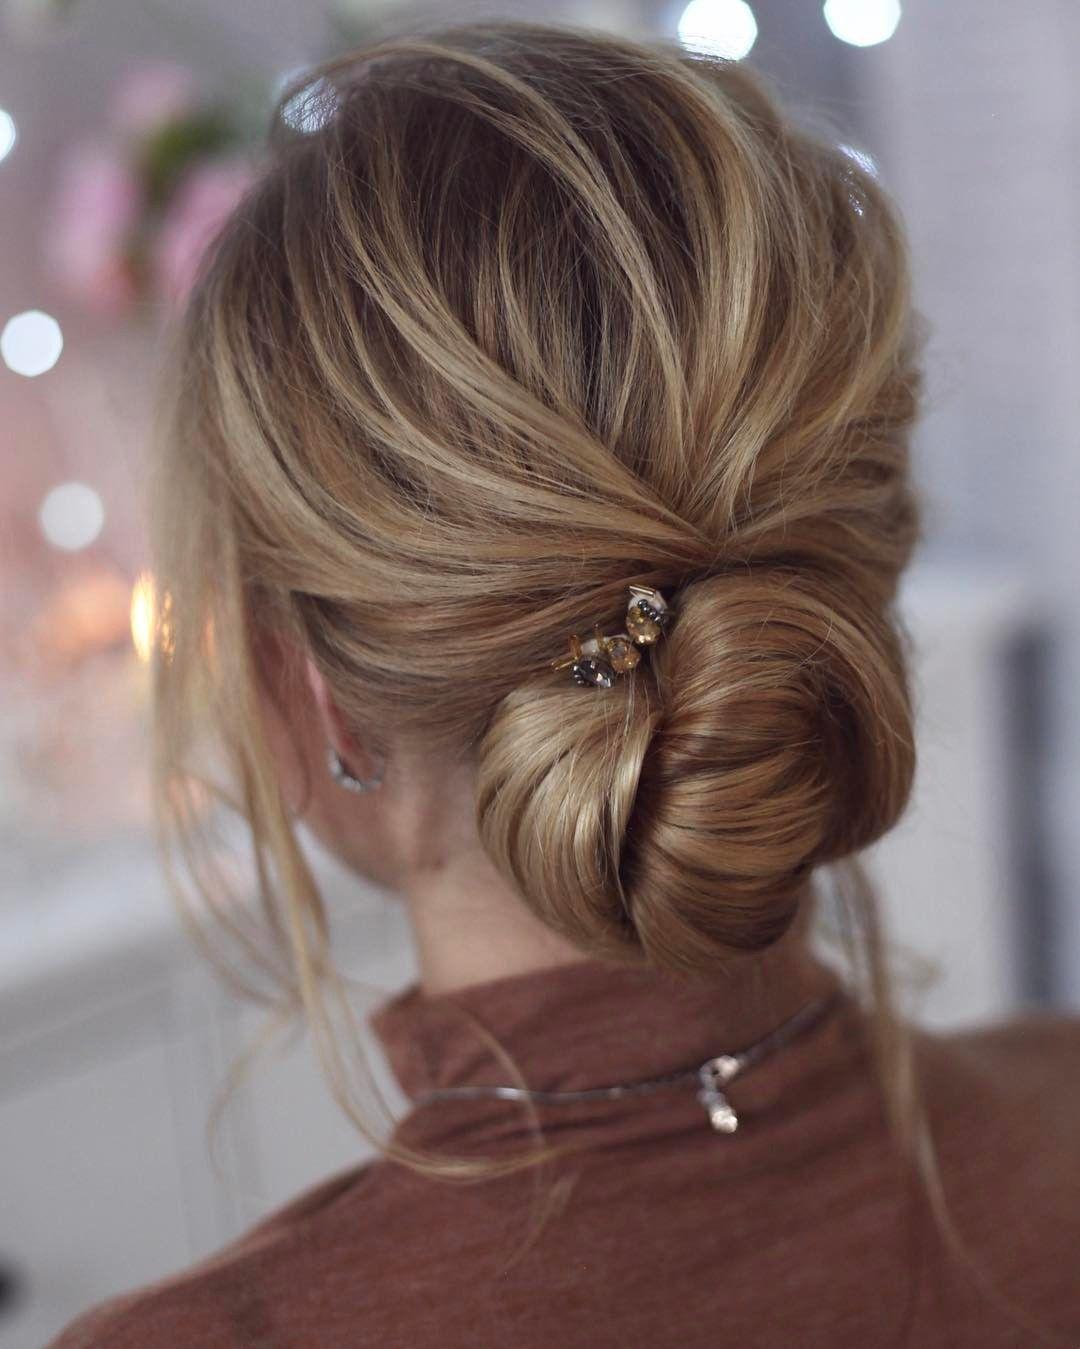 Pin by adylib cano on peinados pinterest bun hairstyle hair dos